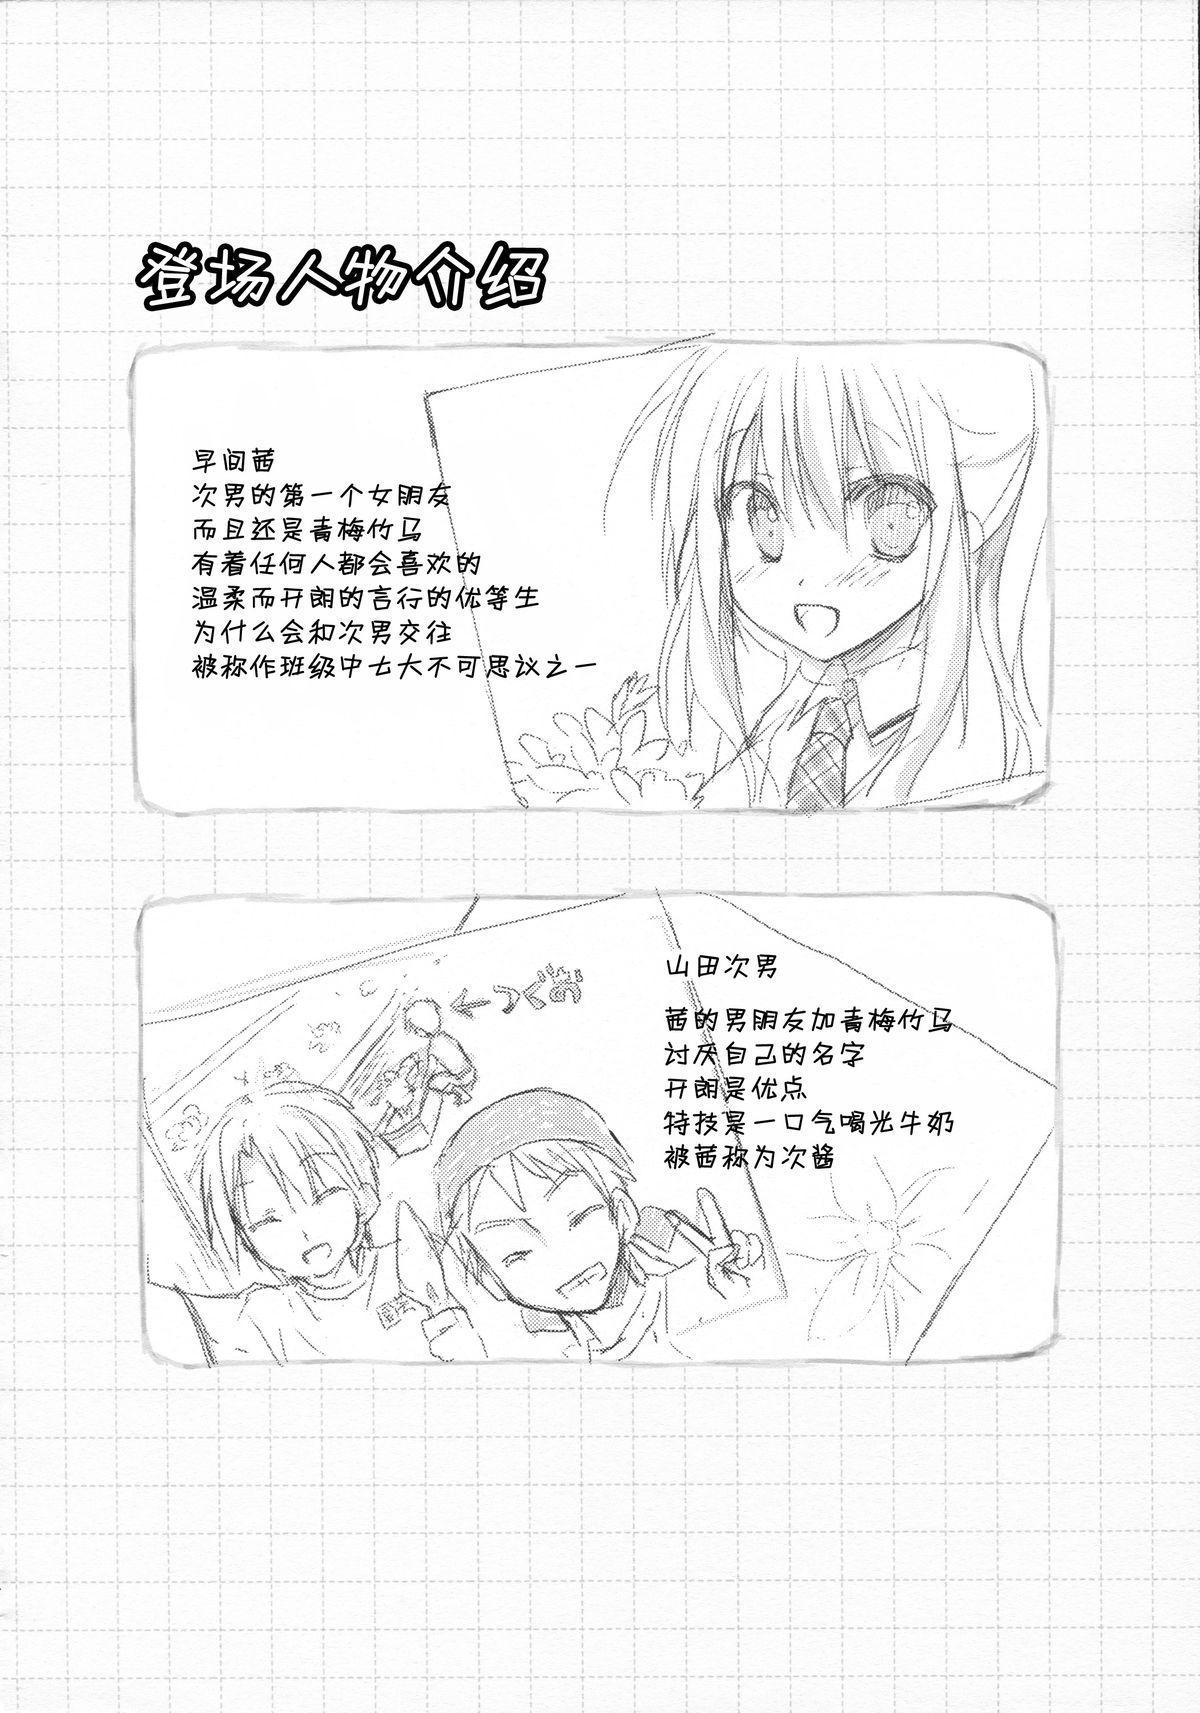 Onsen Sube-sube Kanojo 3